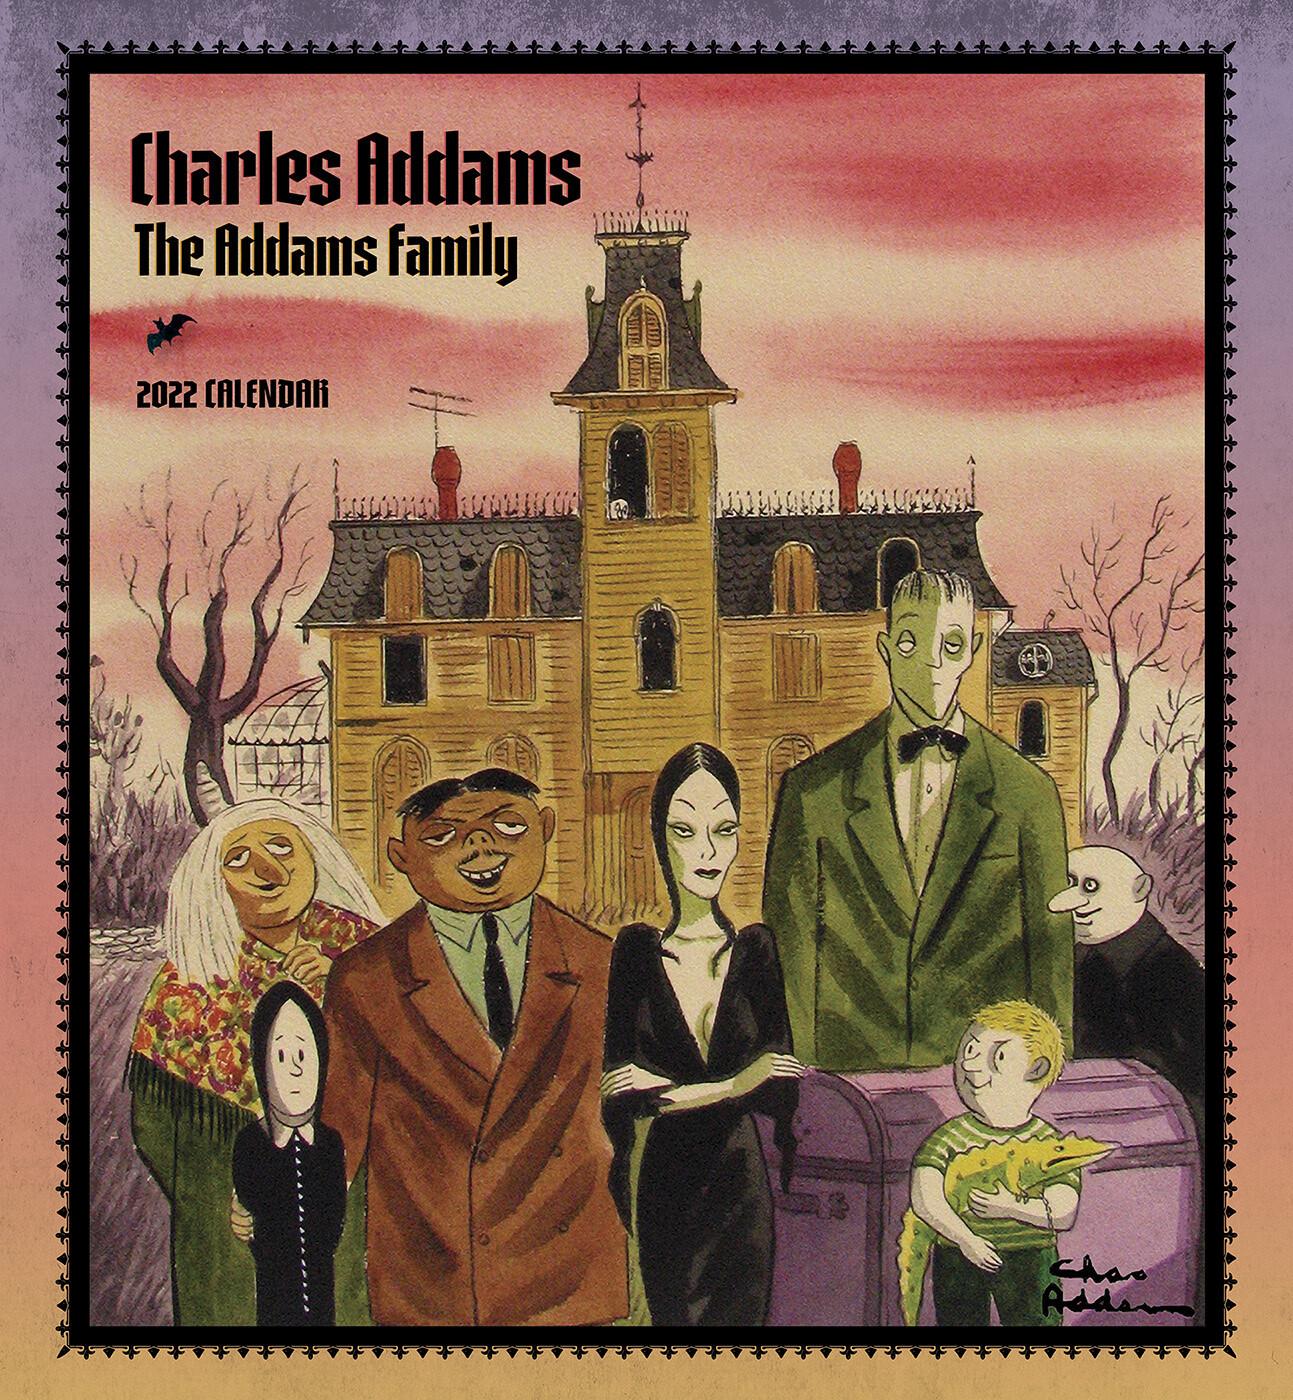 C.Addams: Addams Family 2022 Wall Calendar